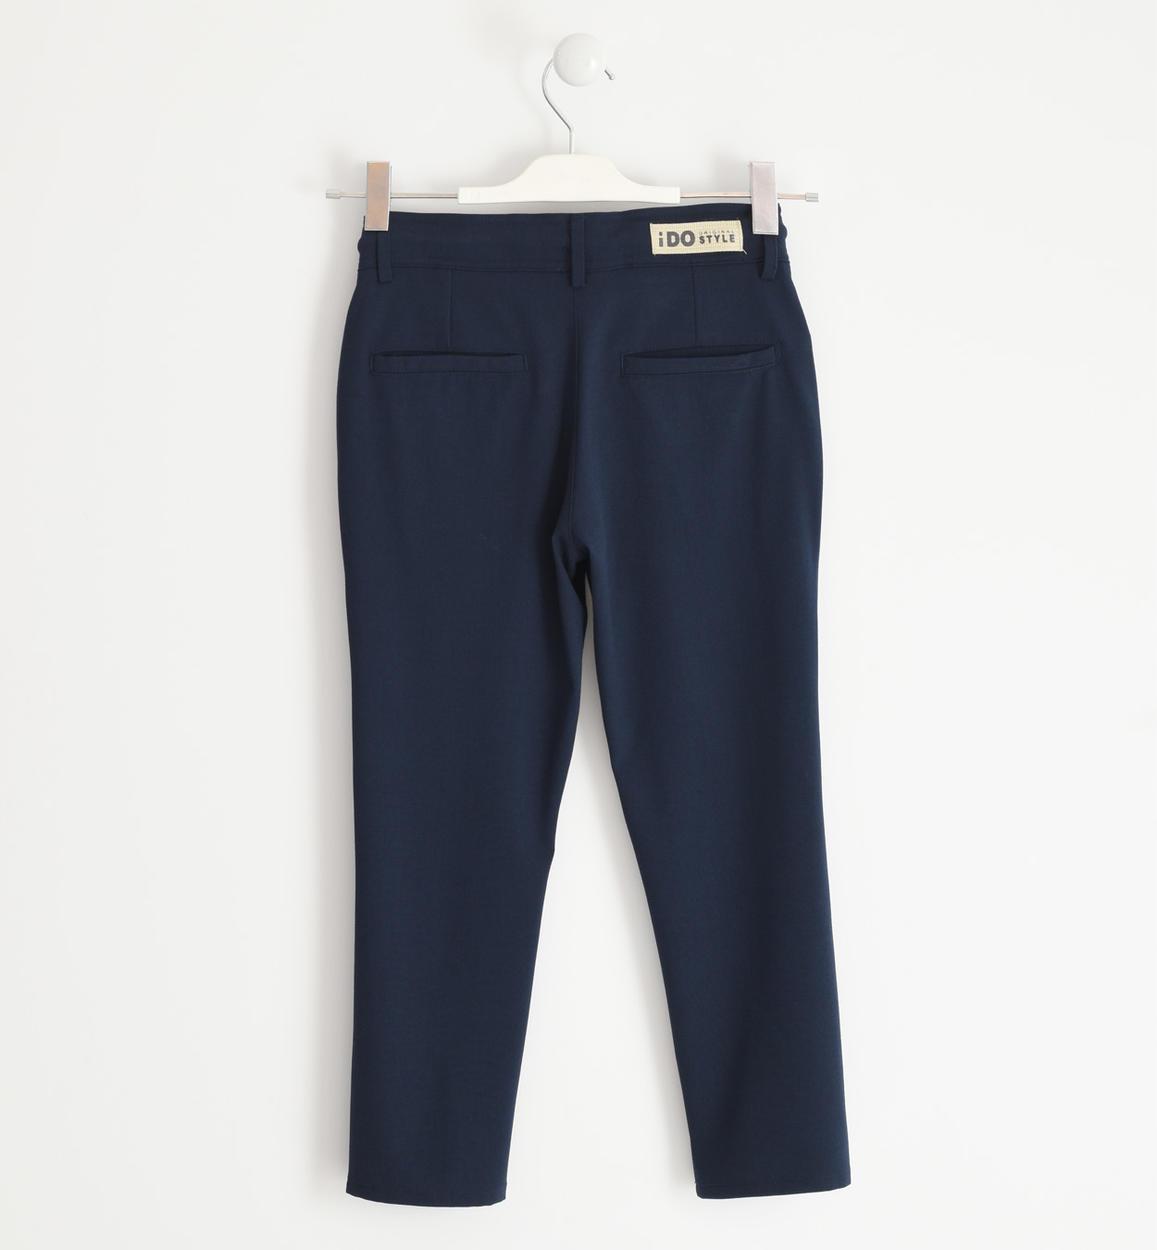 pantalone modello carrot fit per bambino navy retro 02 2524j43300 3885 150x150